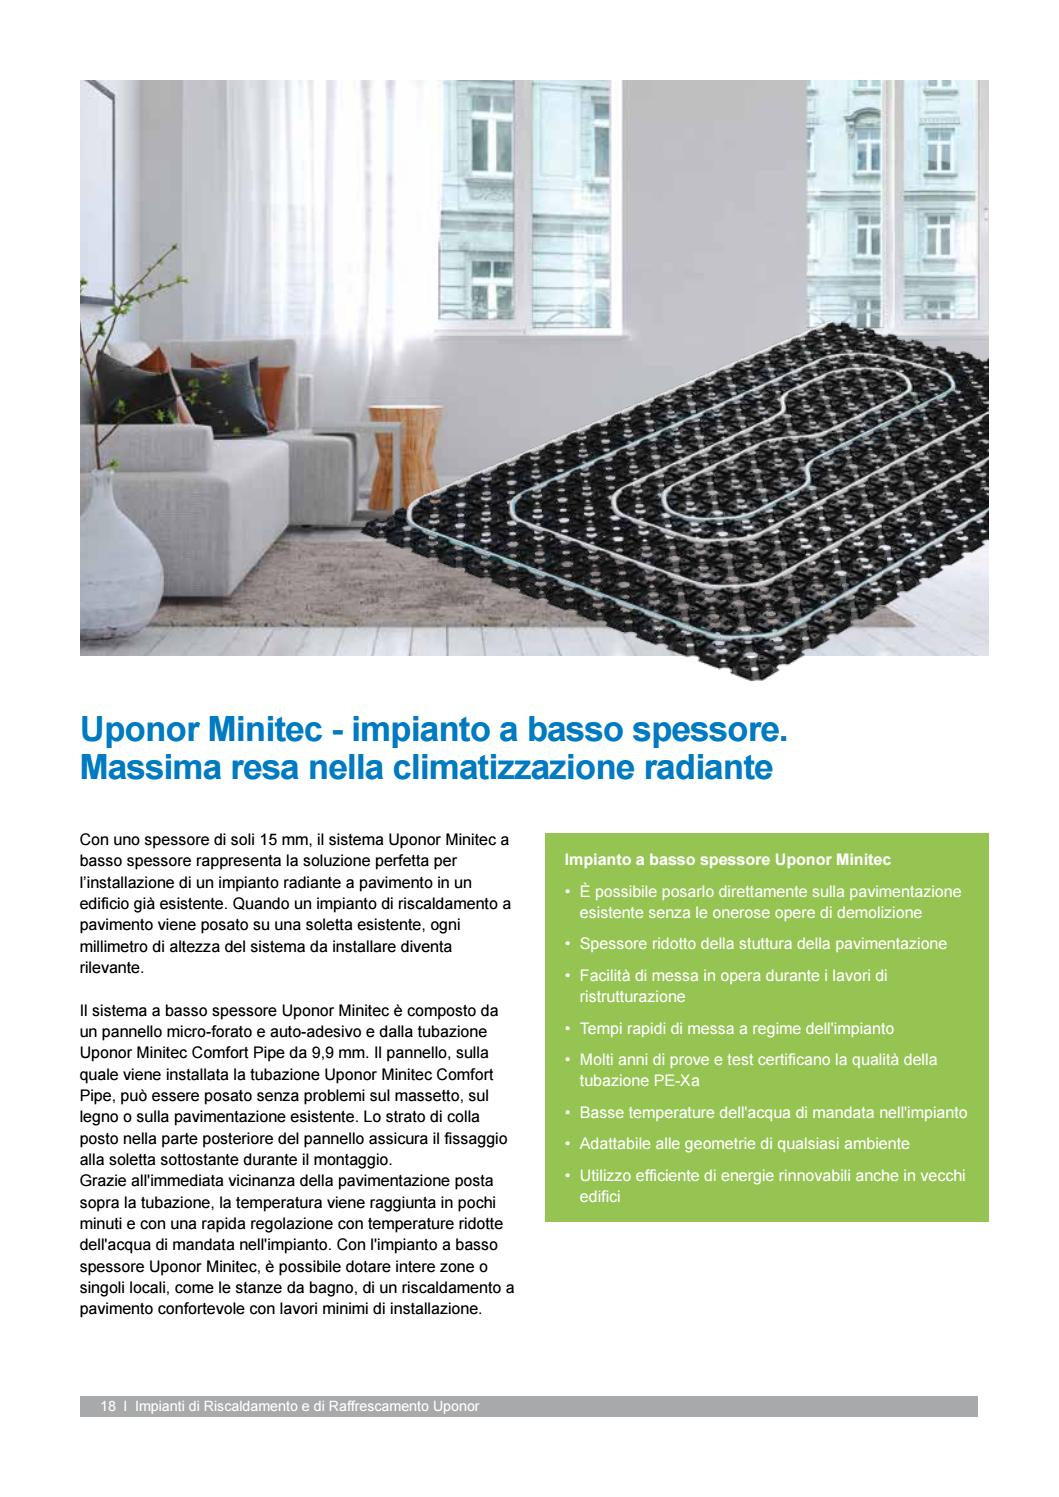 Temperatura Mandata Impianto A Pavimento scheda info minitec by uponorit - issuu